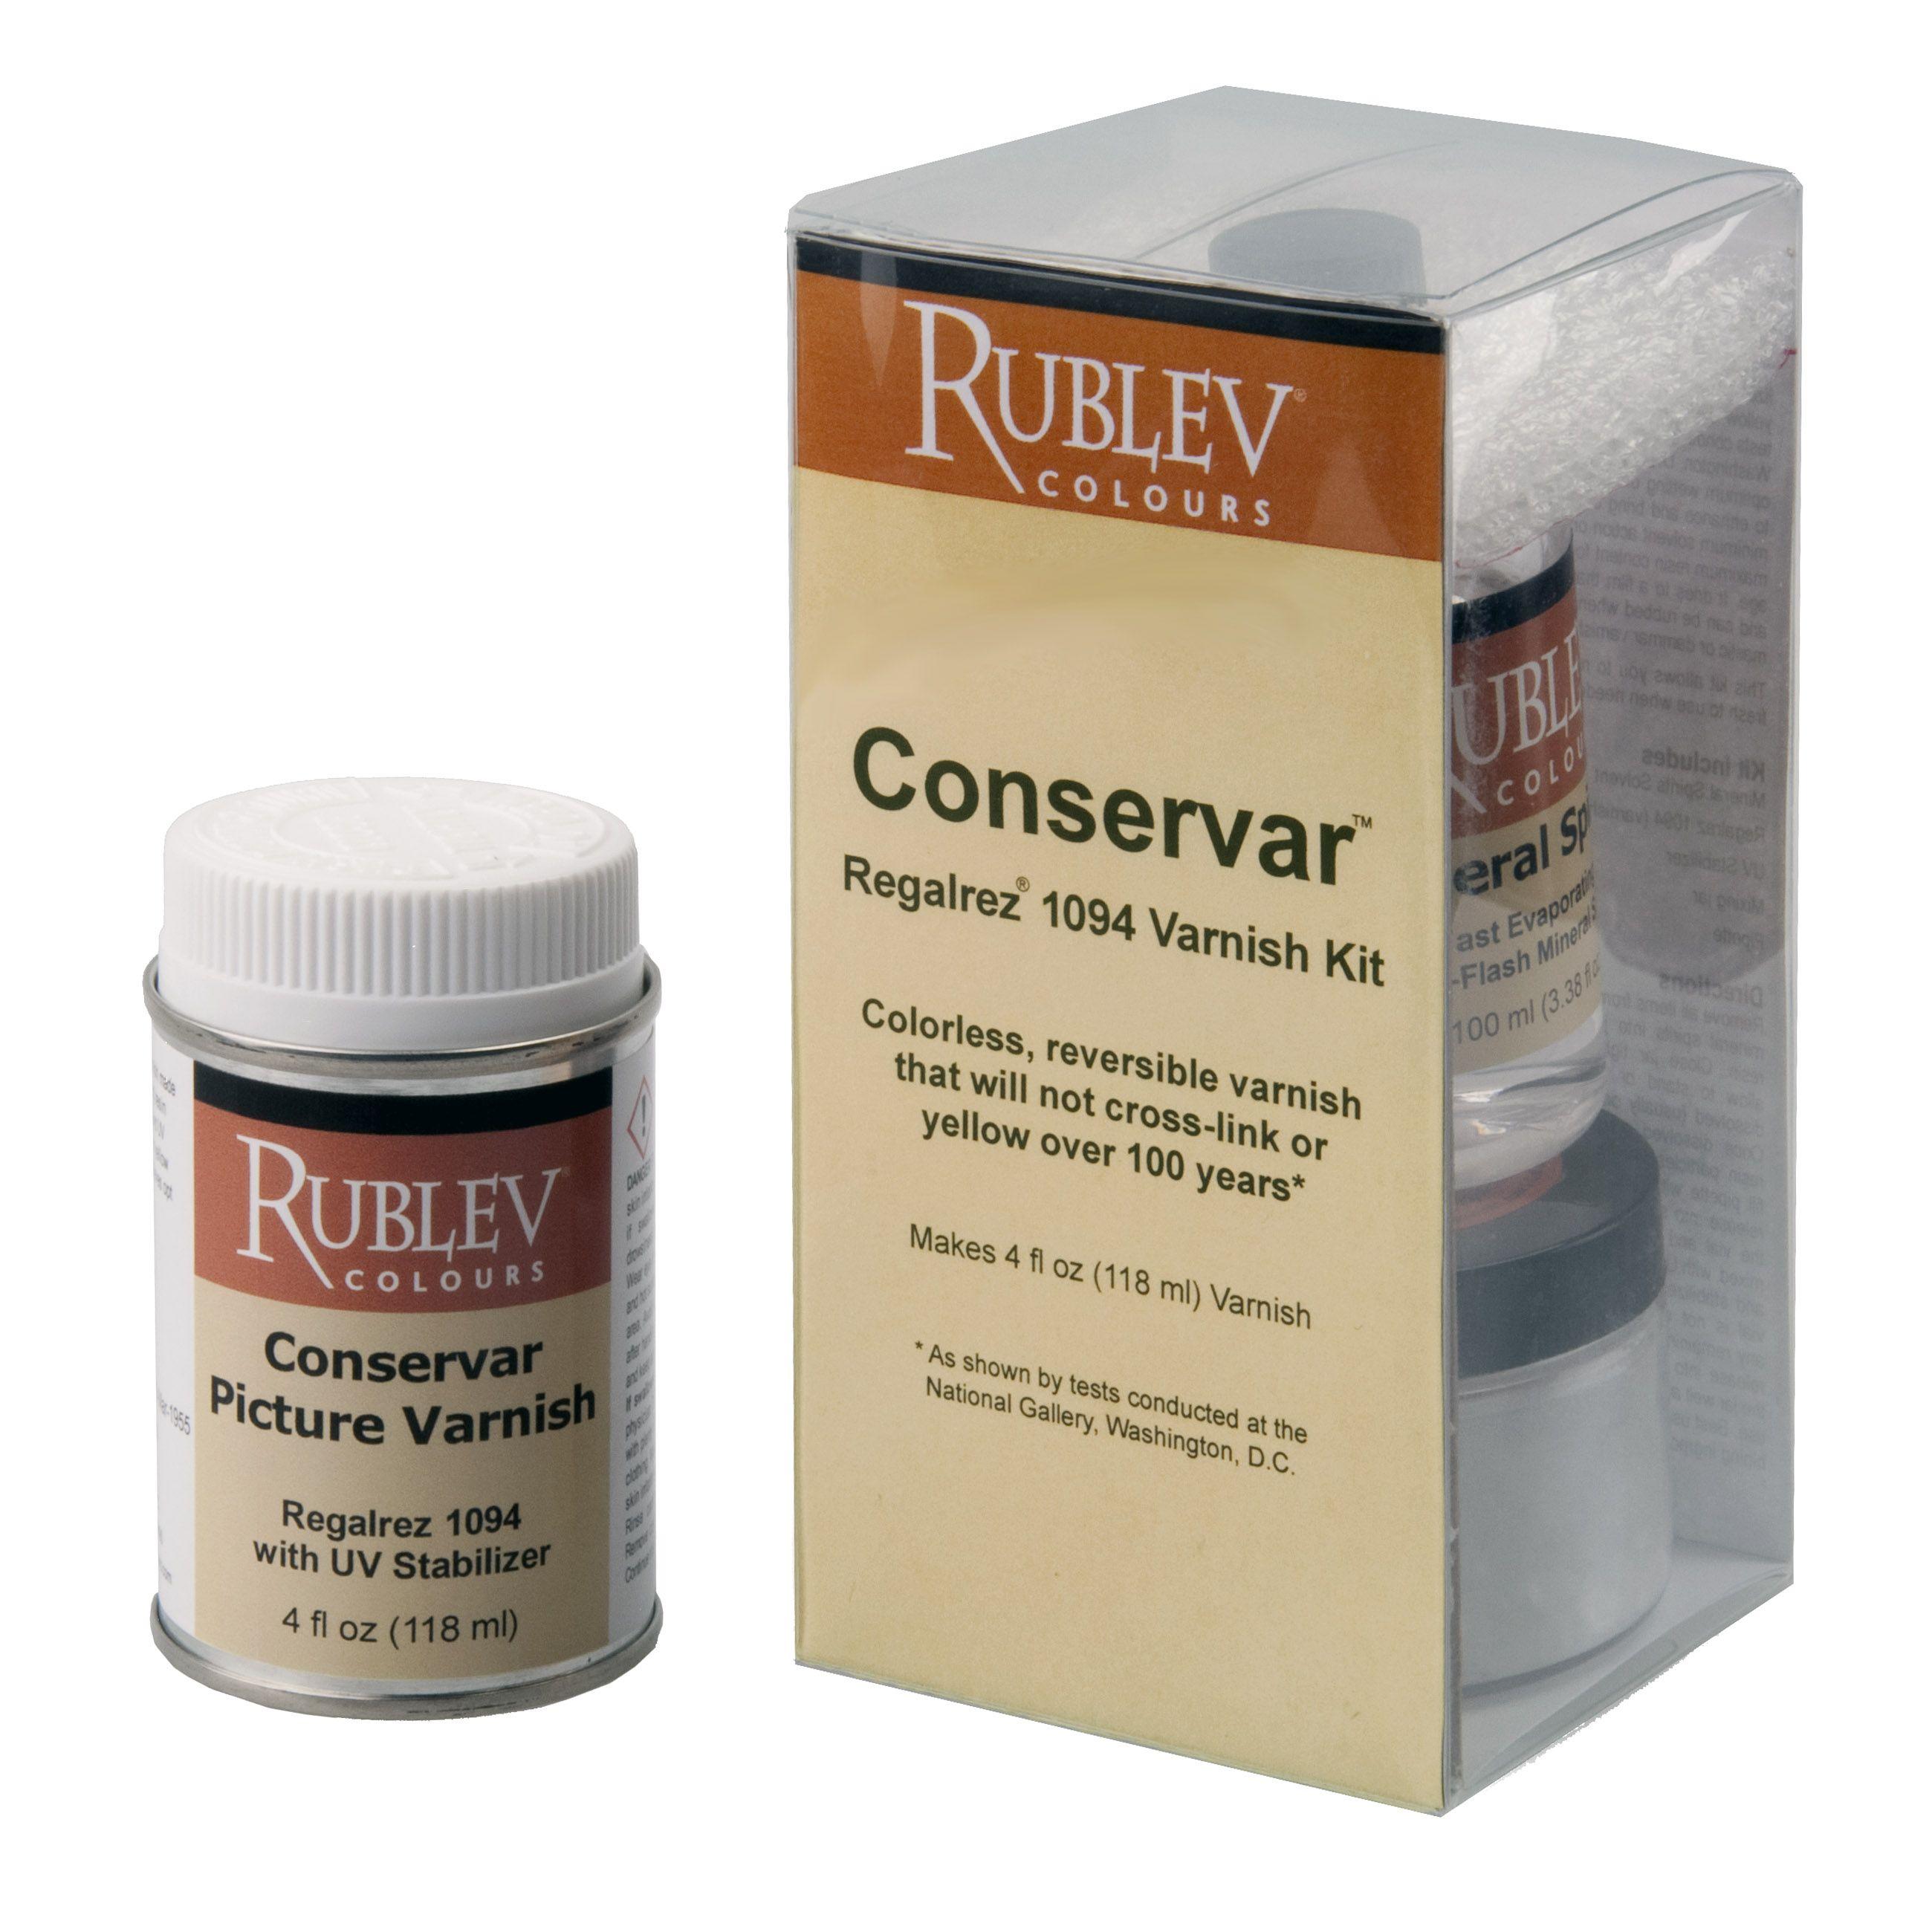 Conservar Varnishes and Varnish Kits